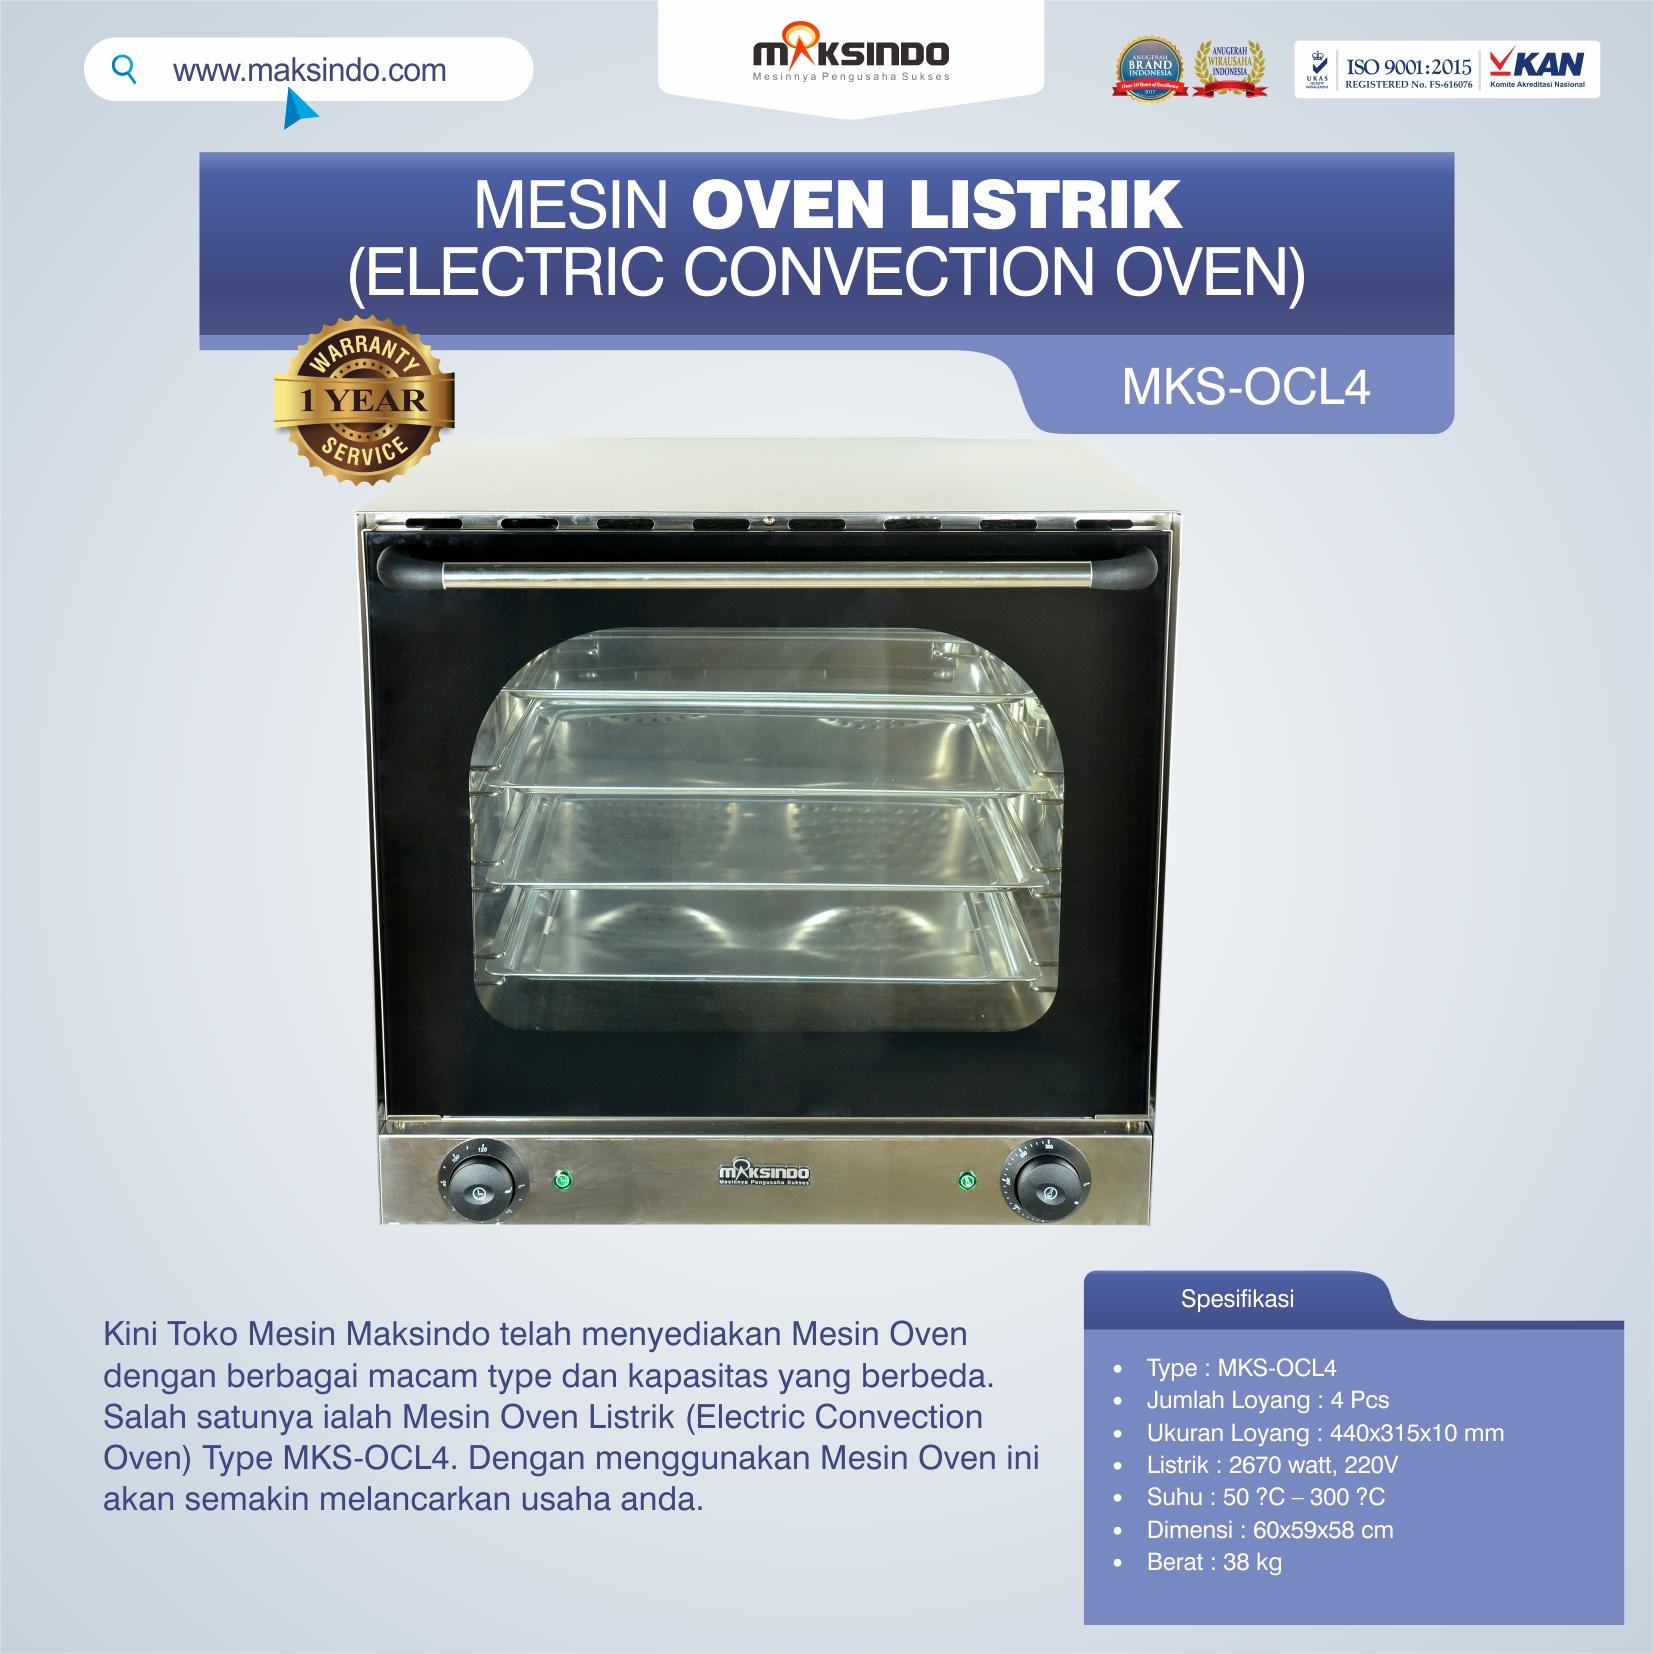 Jual Mesin Oven Listrik (Electric Convection Oven) MKS-OCL4 di Semarang